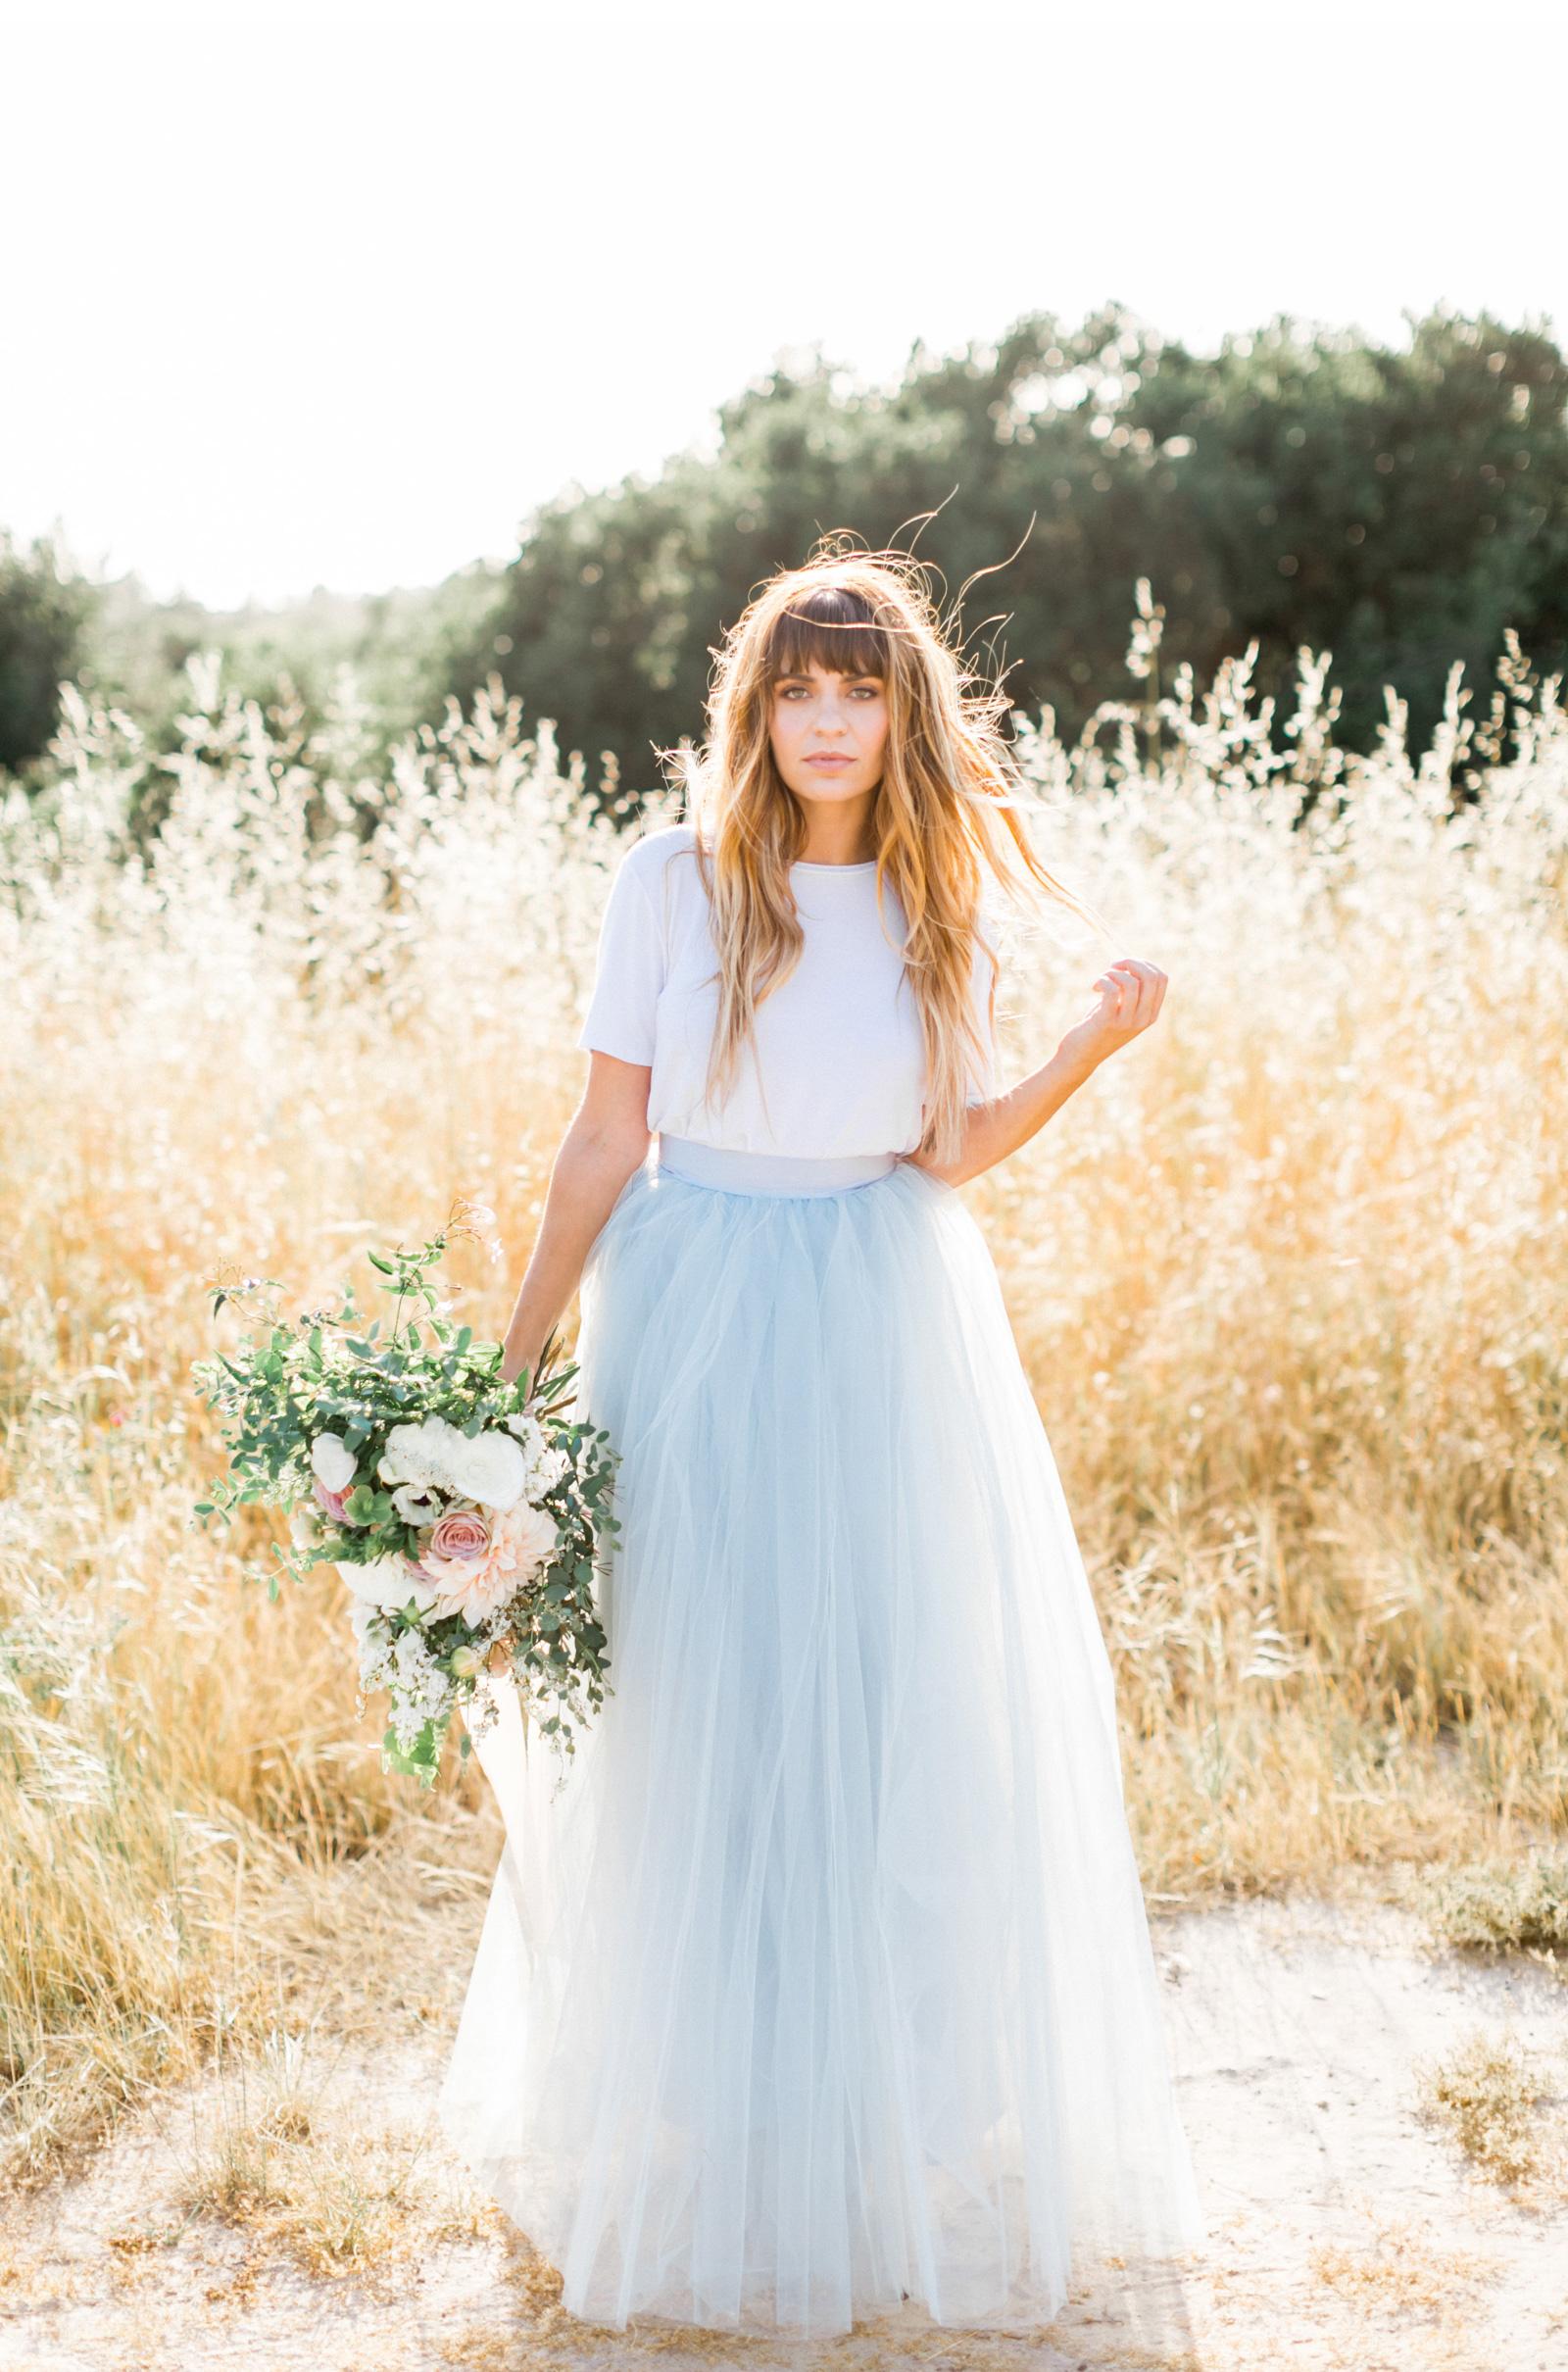 San-Luis-Obispo-Wedding-Photographer-Natalie-Schutt-Photography_21.jpg